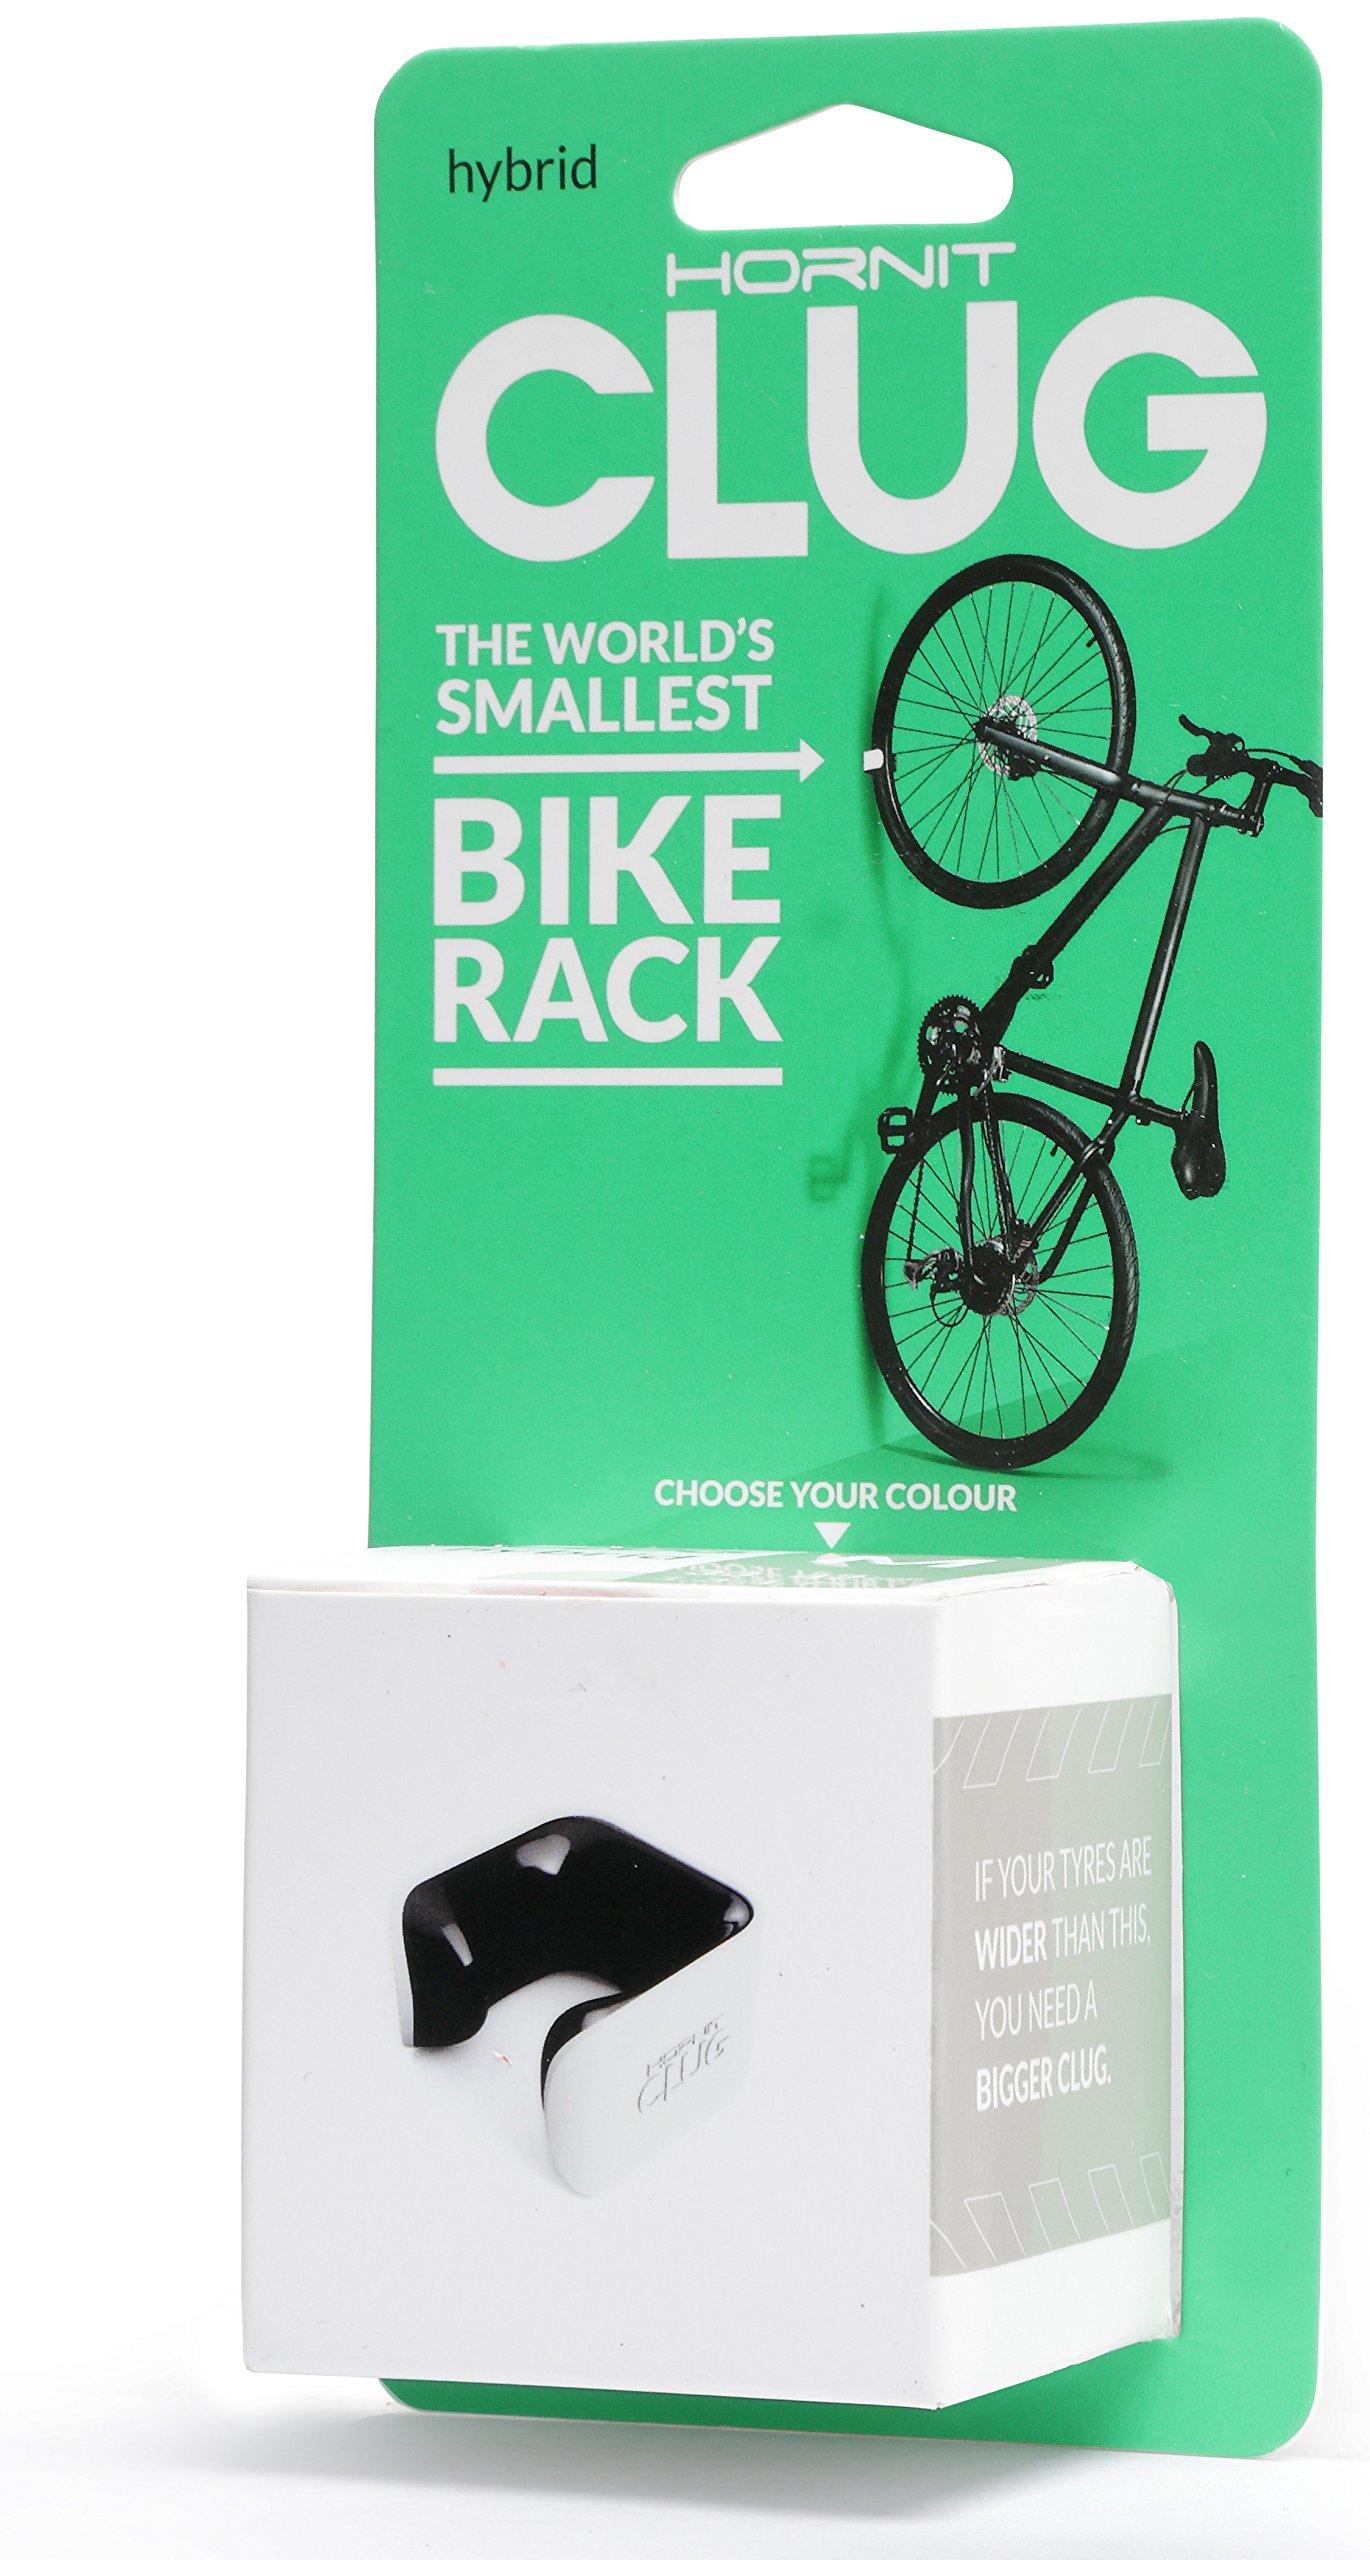 CLUG Bike Clip Indoor Outdoor Hybrid Bicycle Rack Storage System, White/Black, 33-42mm